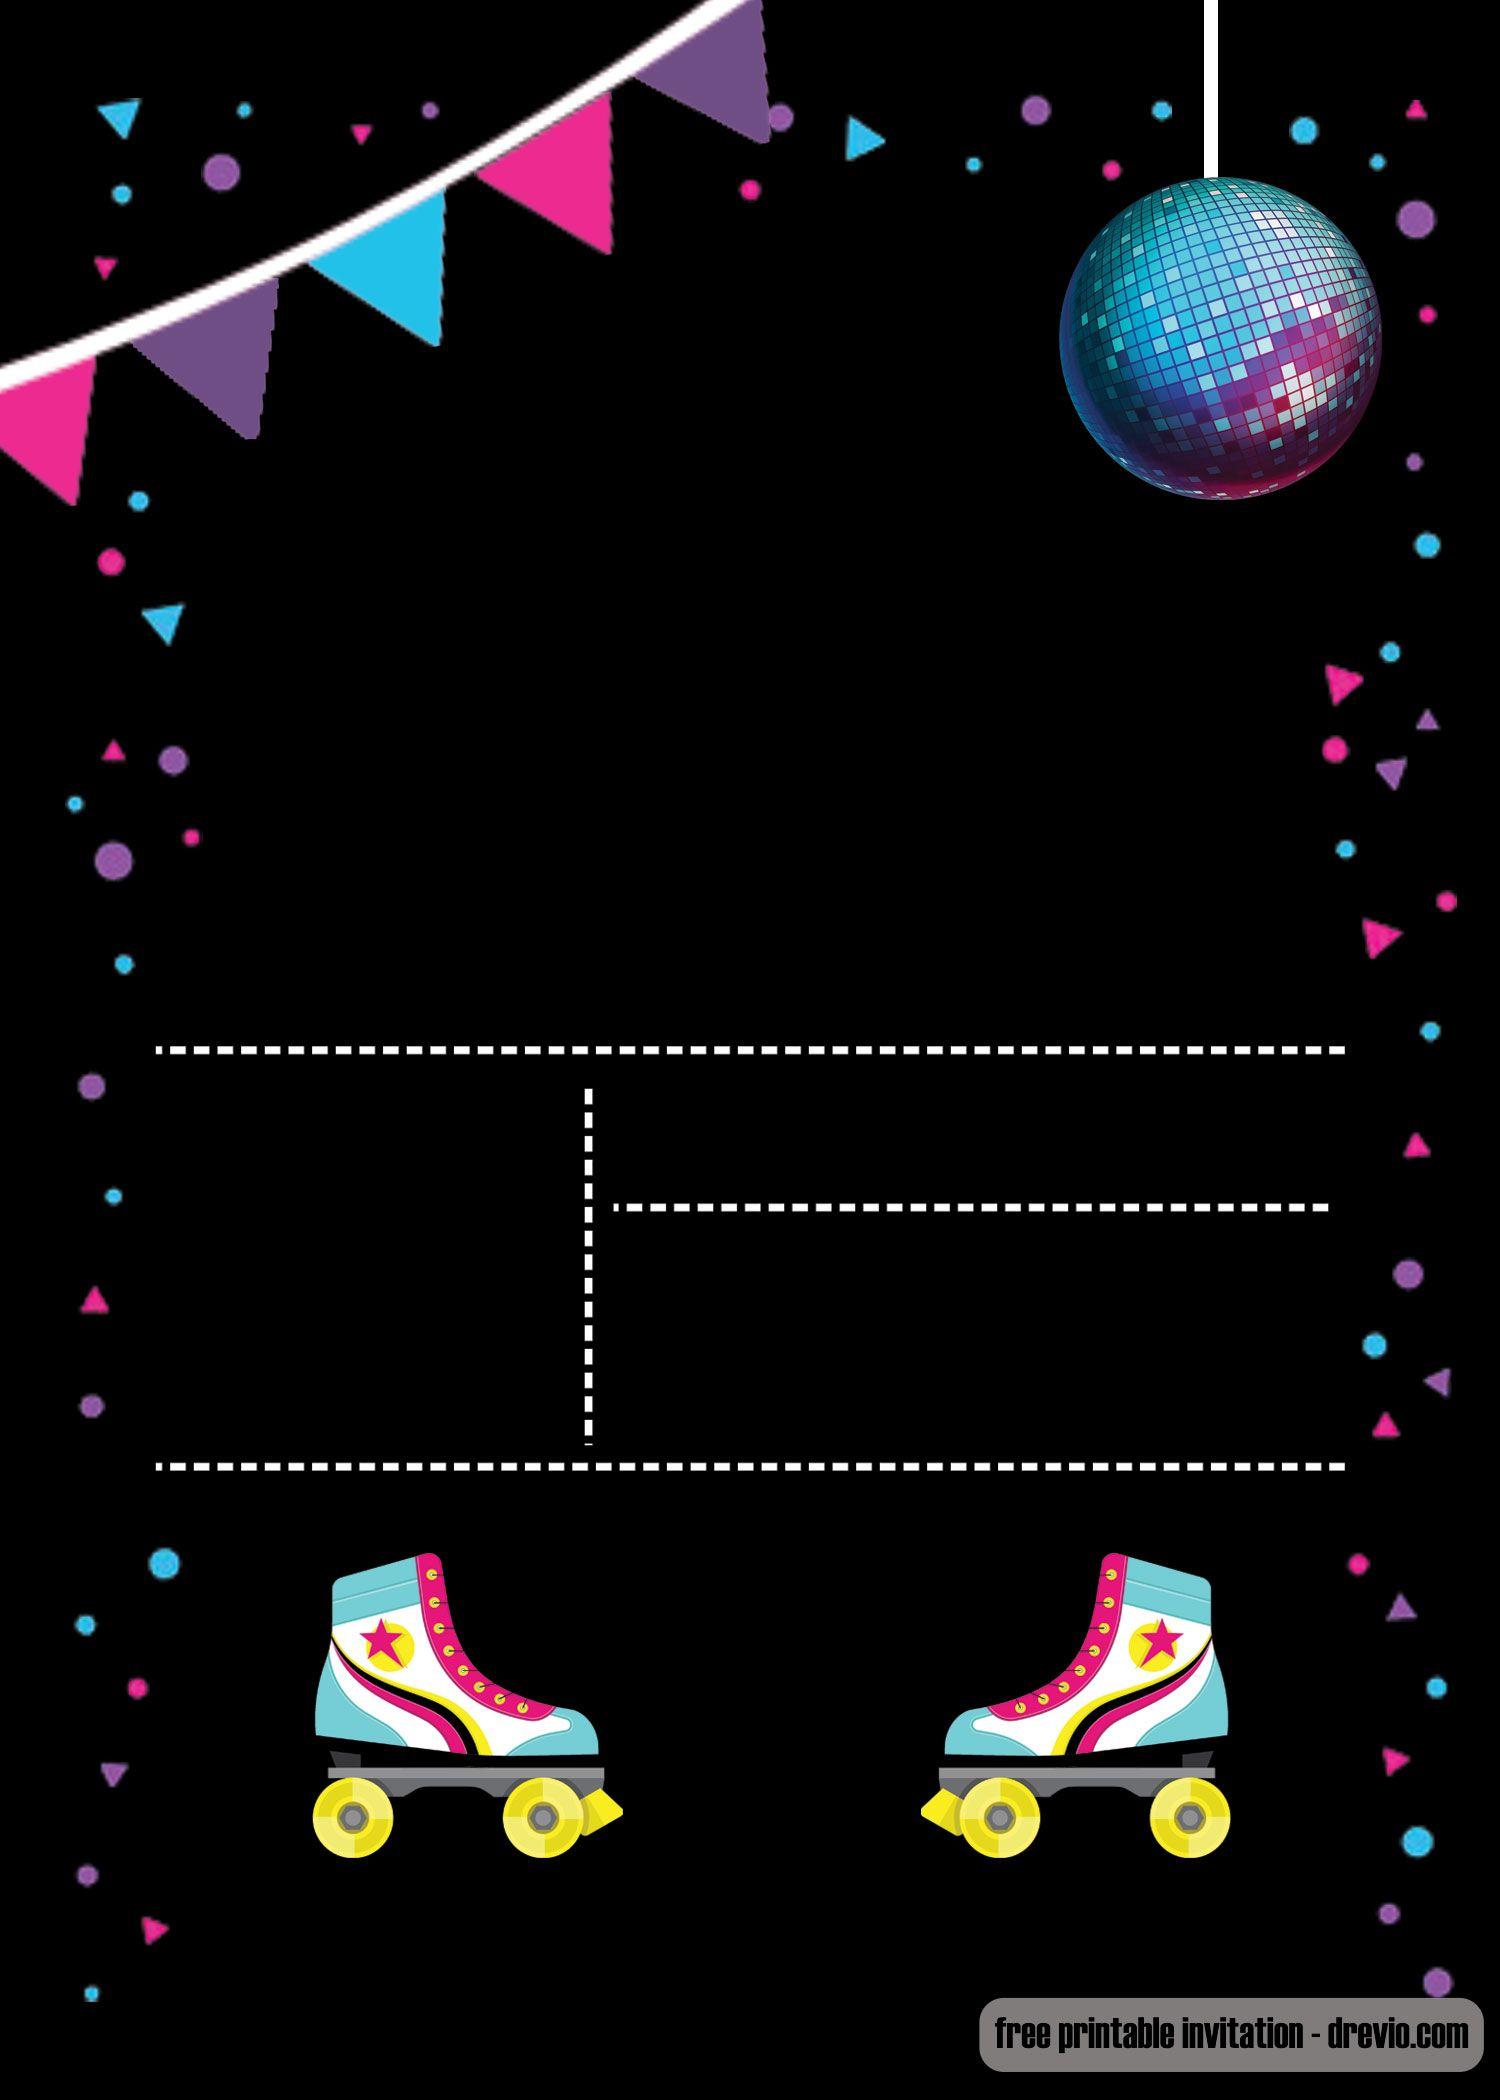 Free Printable Roller Skating Invitation | Invites | Pinterest - Free Printable Skating Invitations